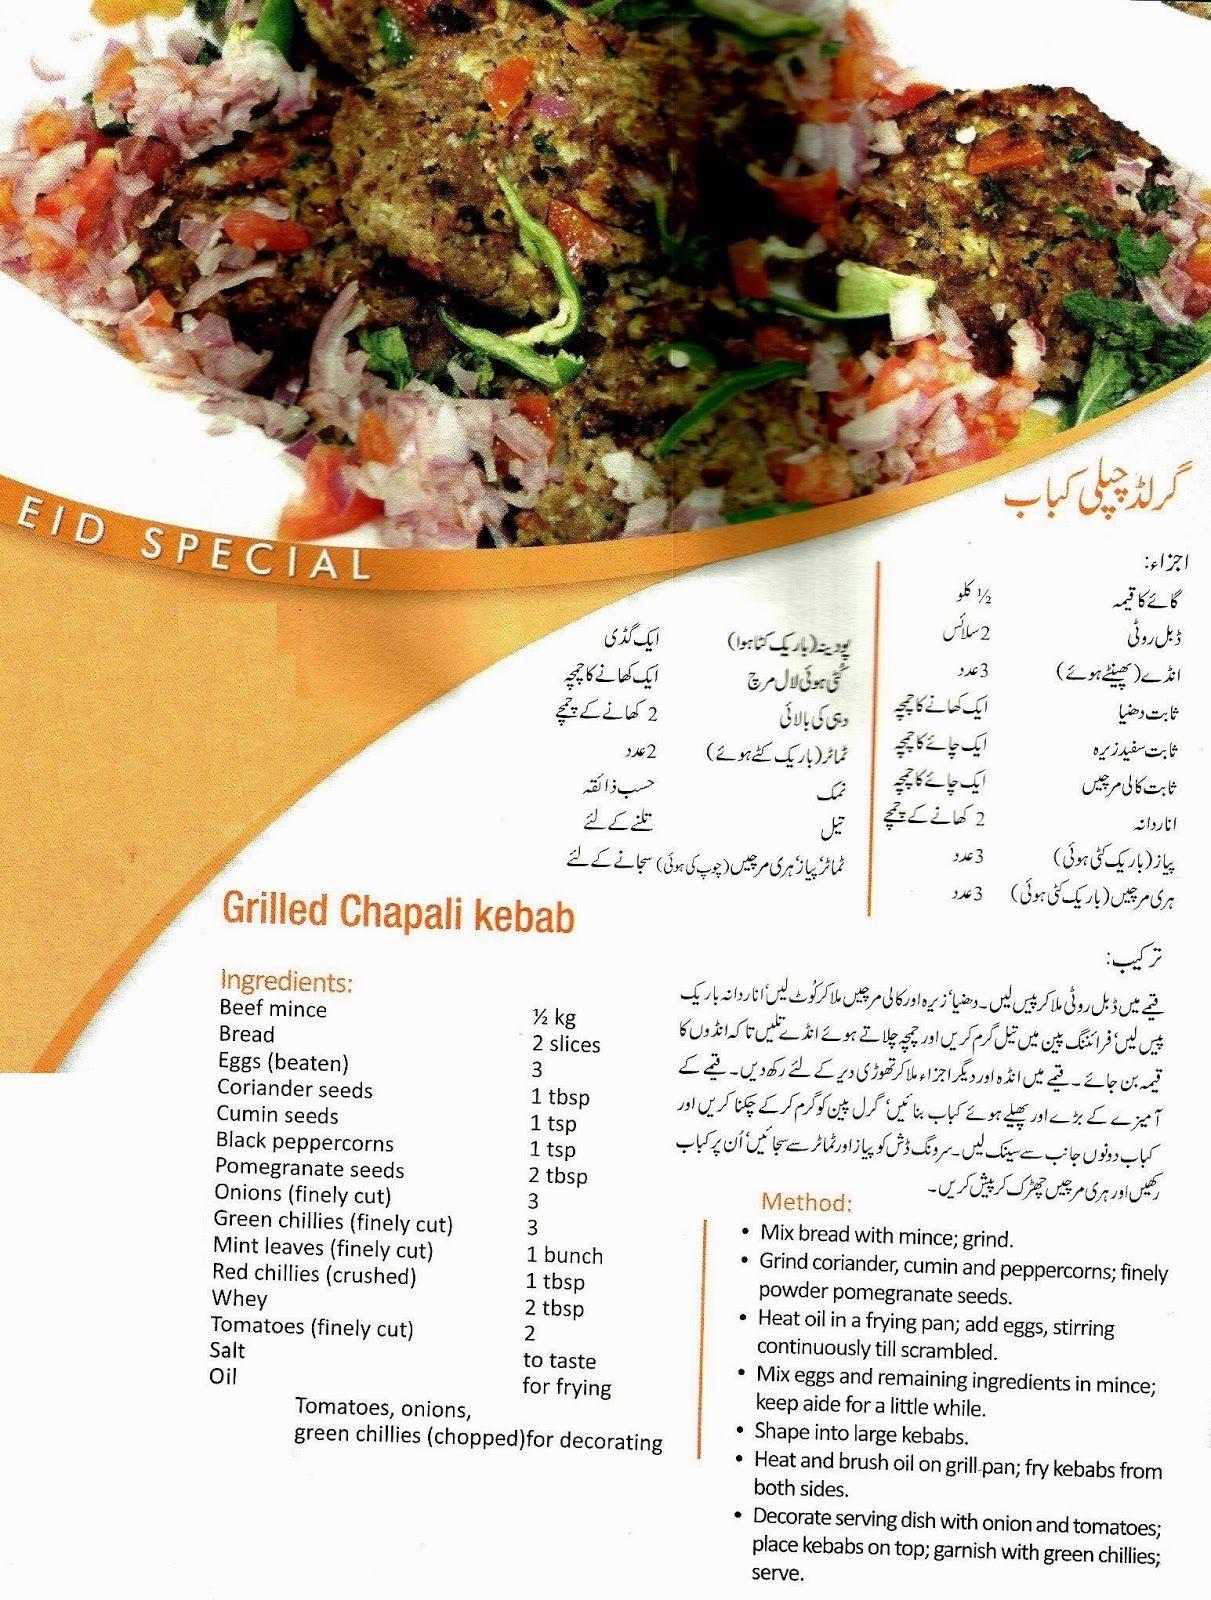 Grilled Chappli Kabab | Food & Food | Pinterest | Grilling, Kebabs ...